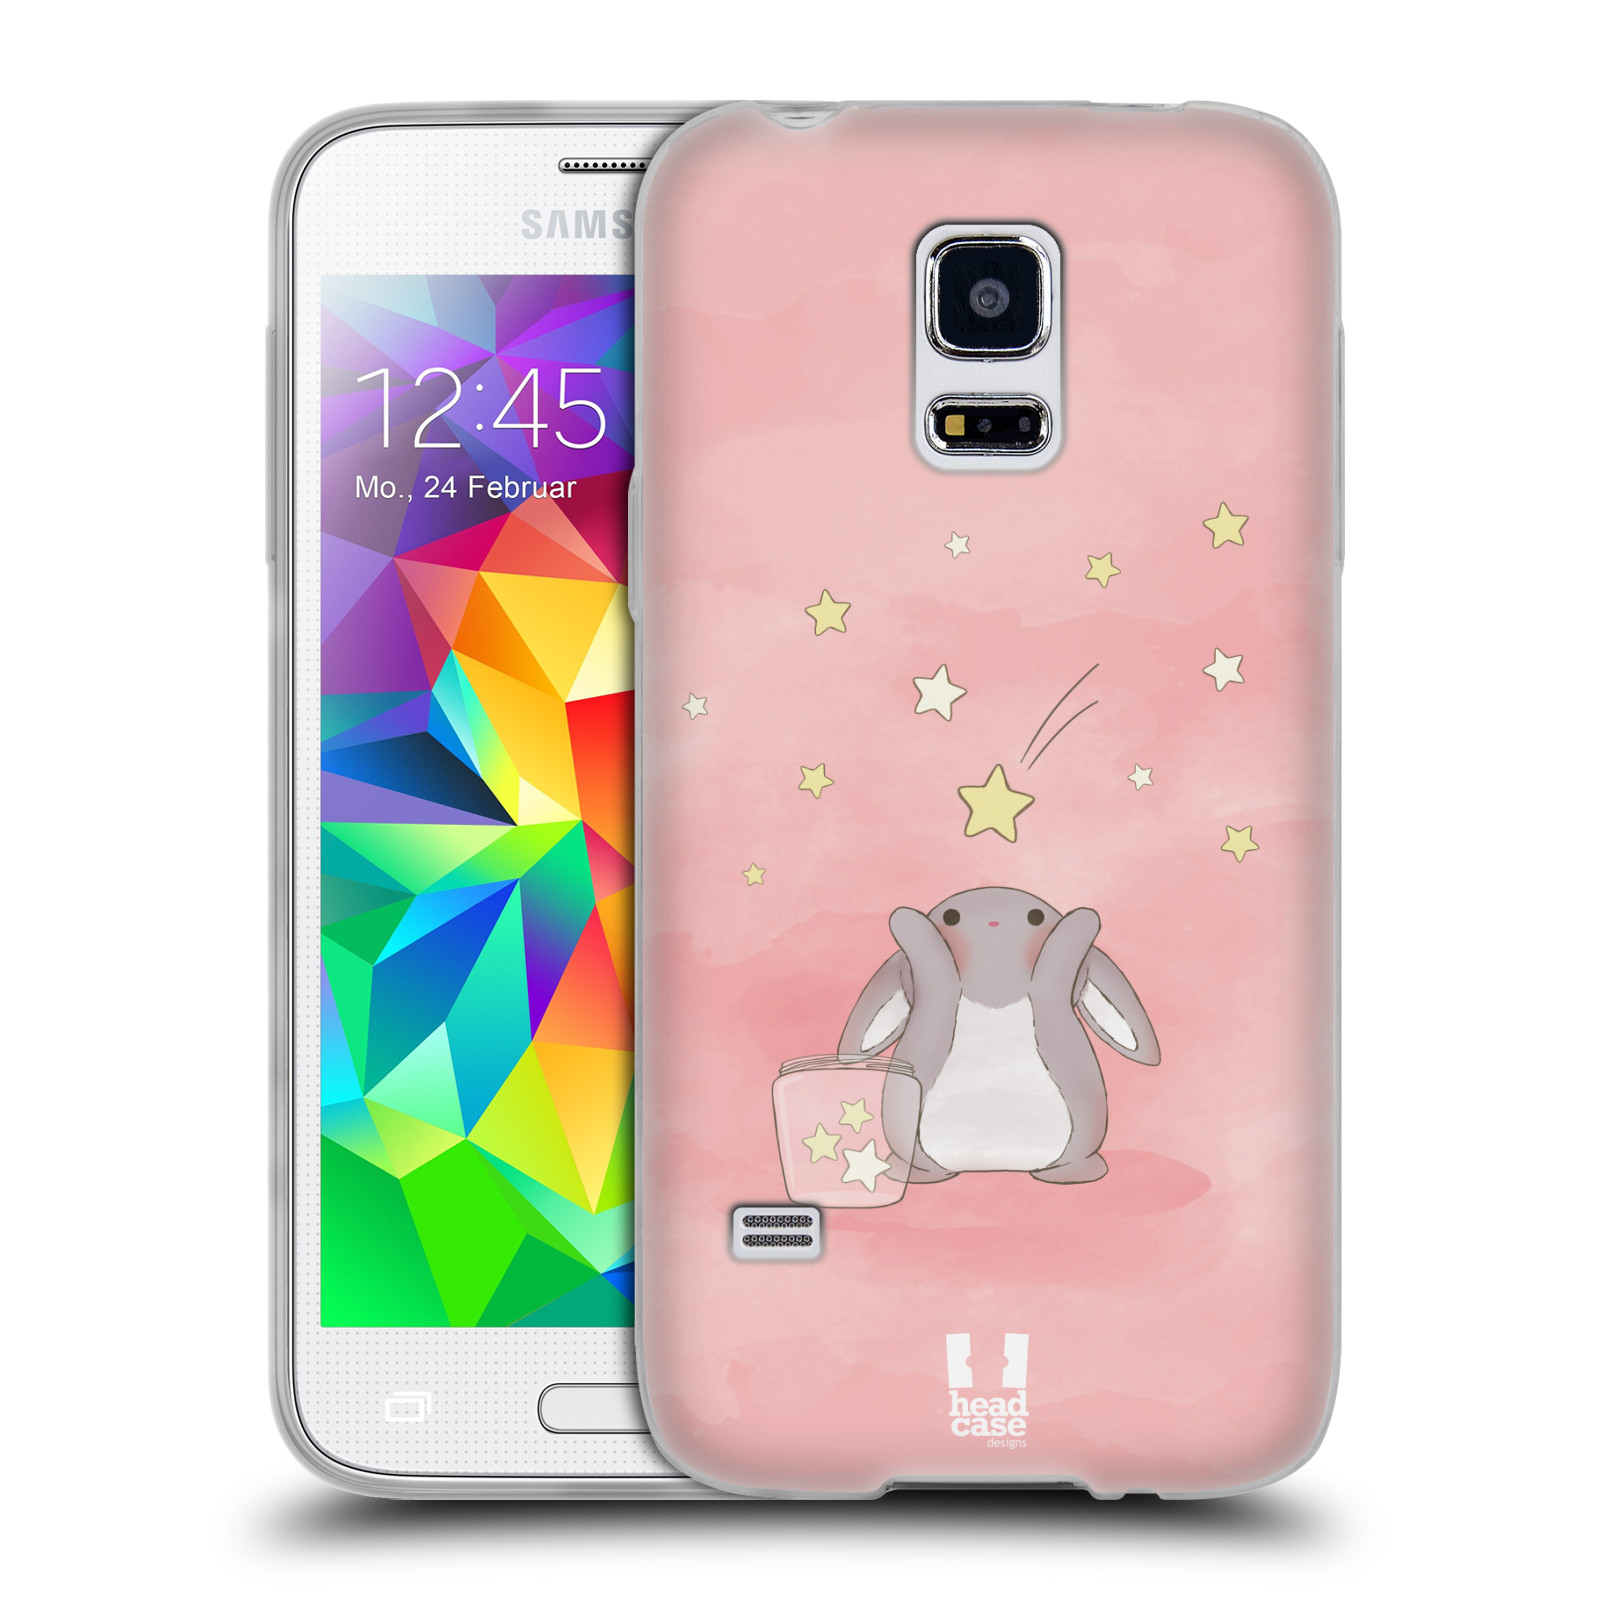 HEAD CASE silikonový obal na mobil Samsung Galaxy S5 MINI vzor králíček a hvězdy růžová